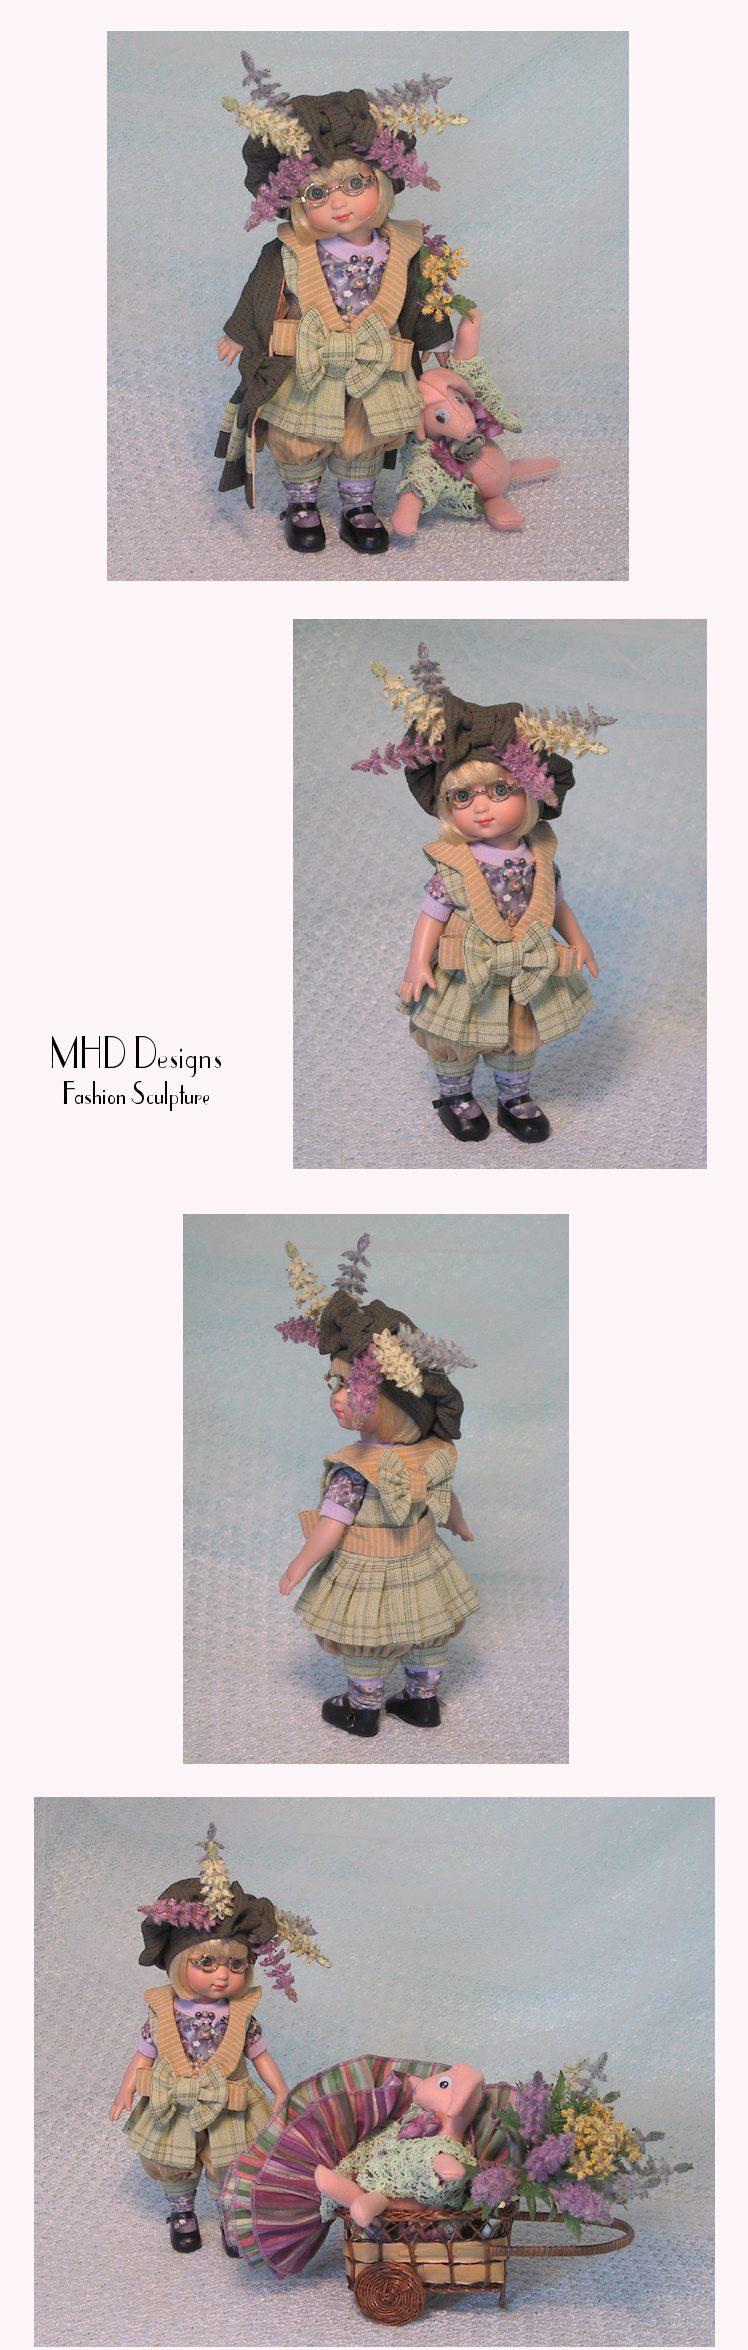 MHD Designs